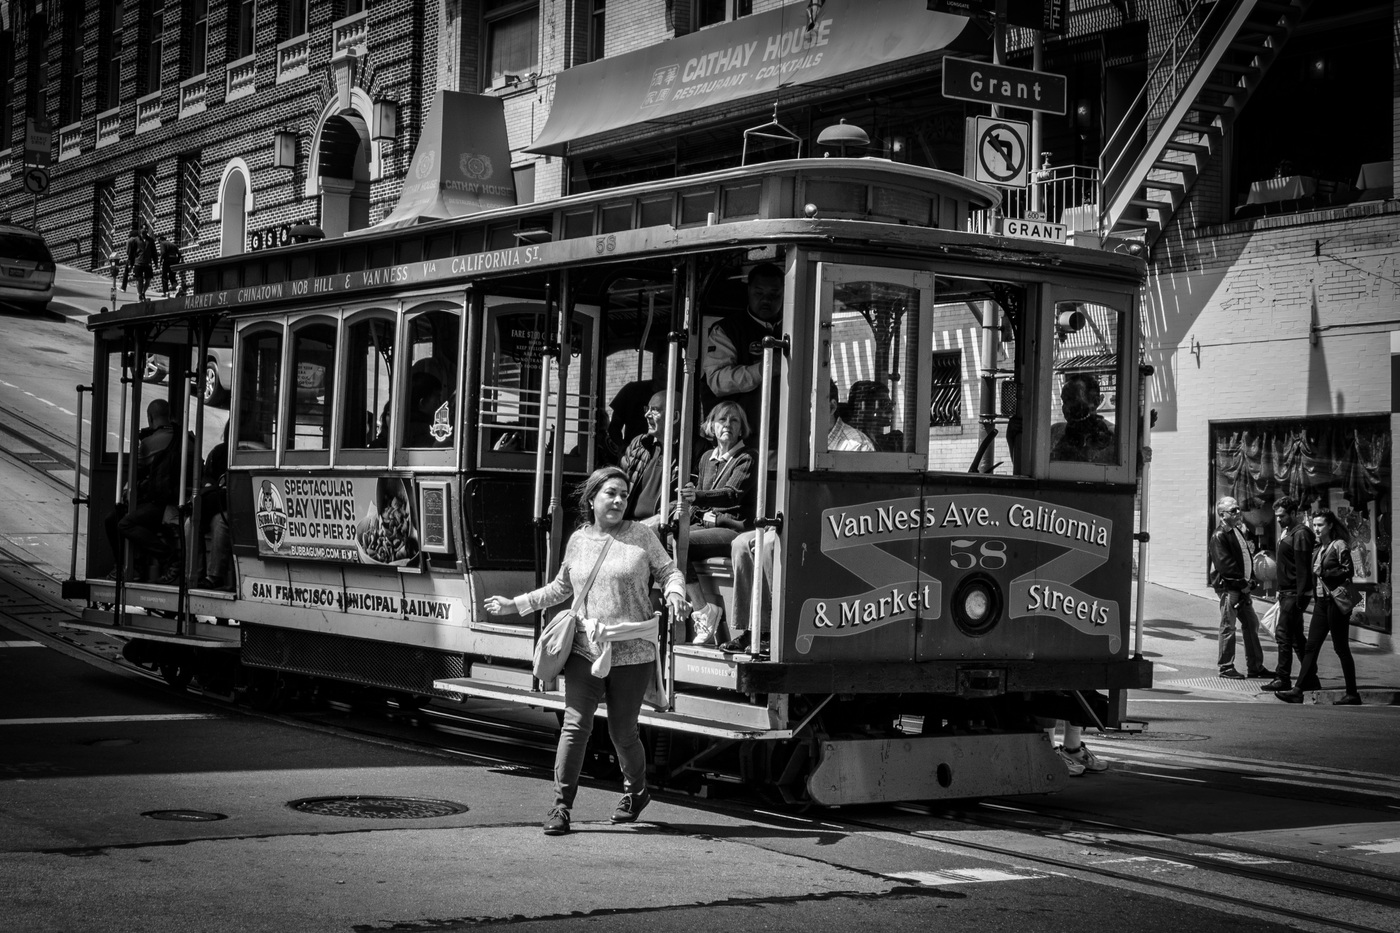 Brett Howard Nelson - San Francisco